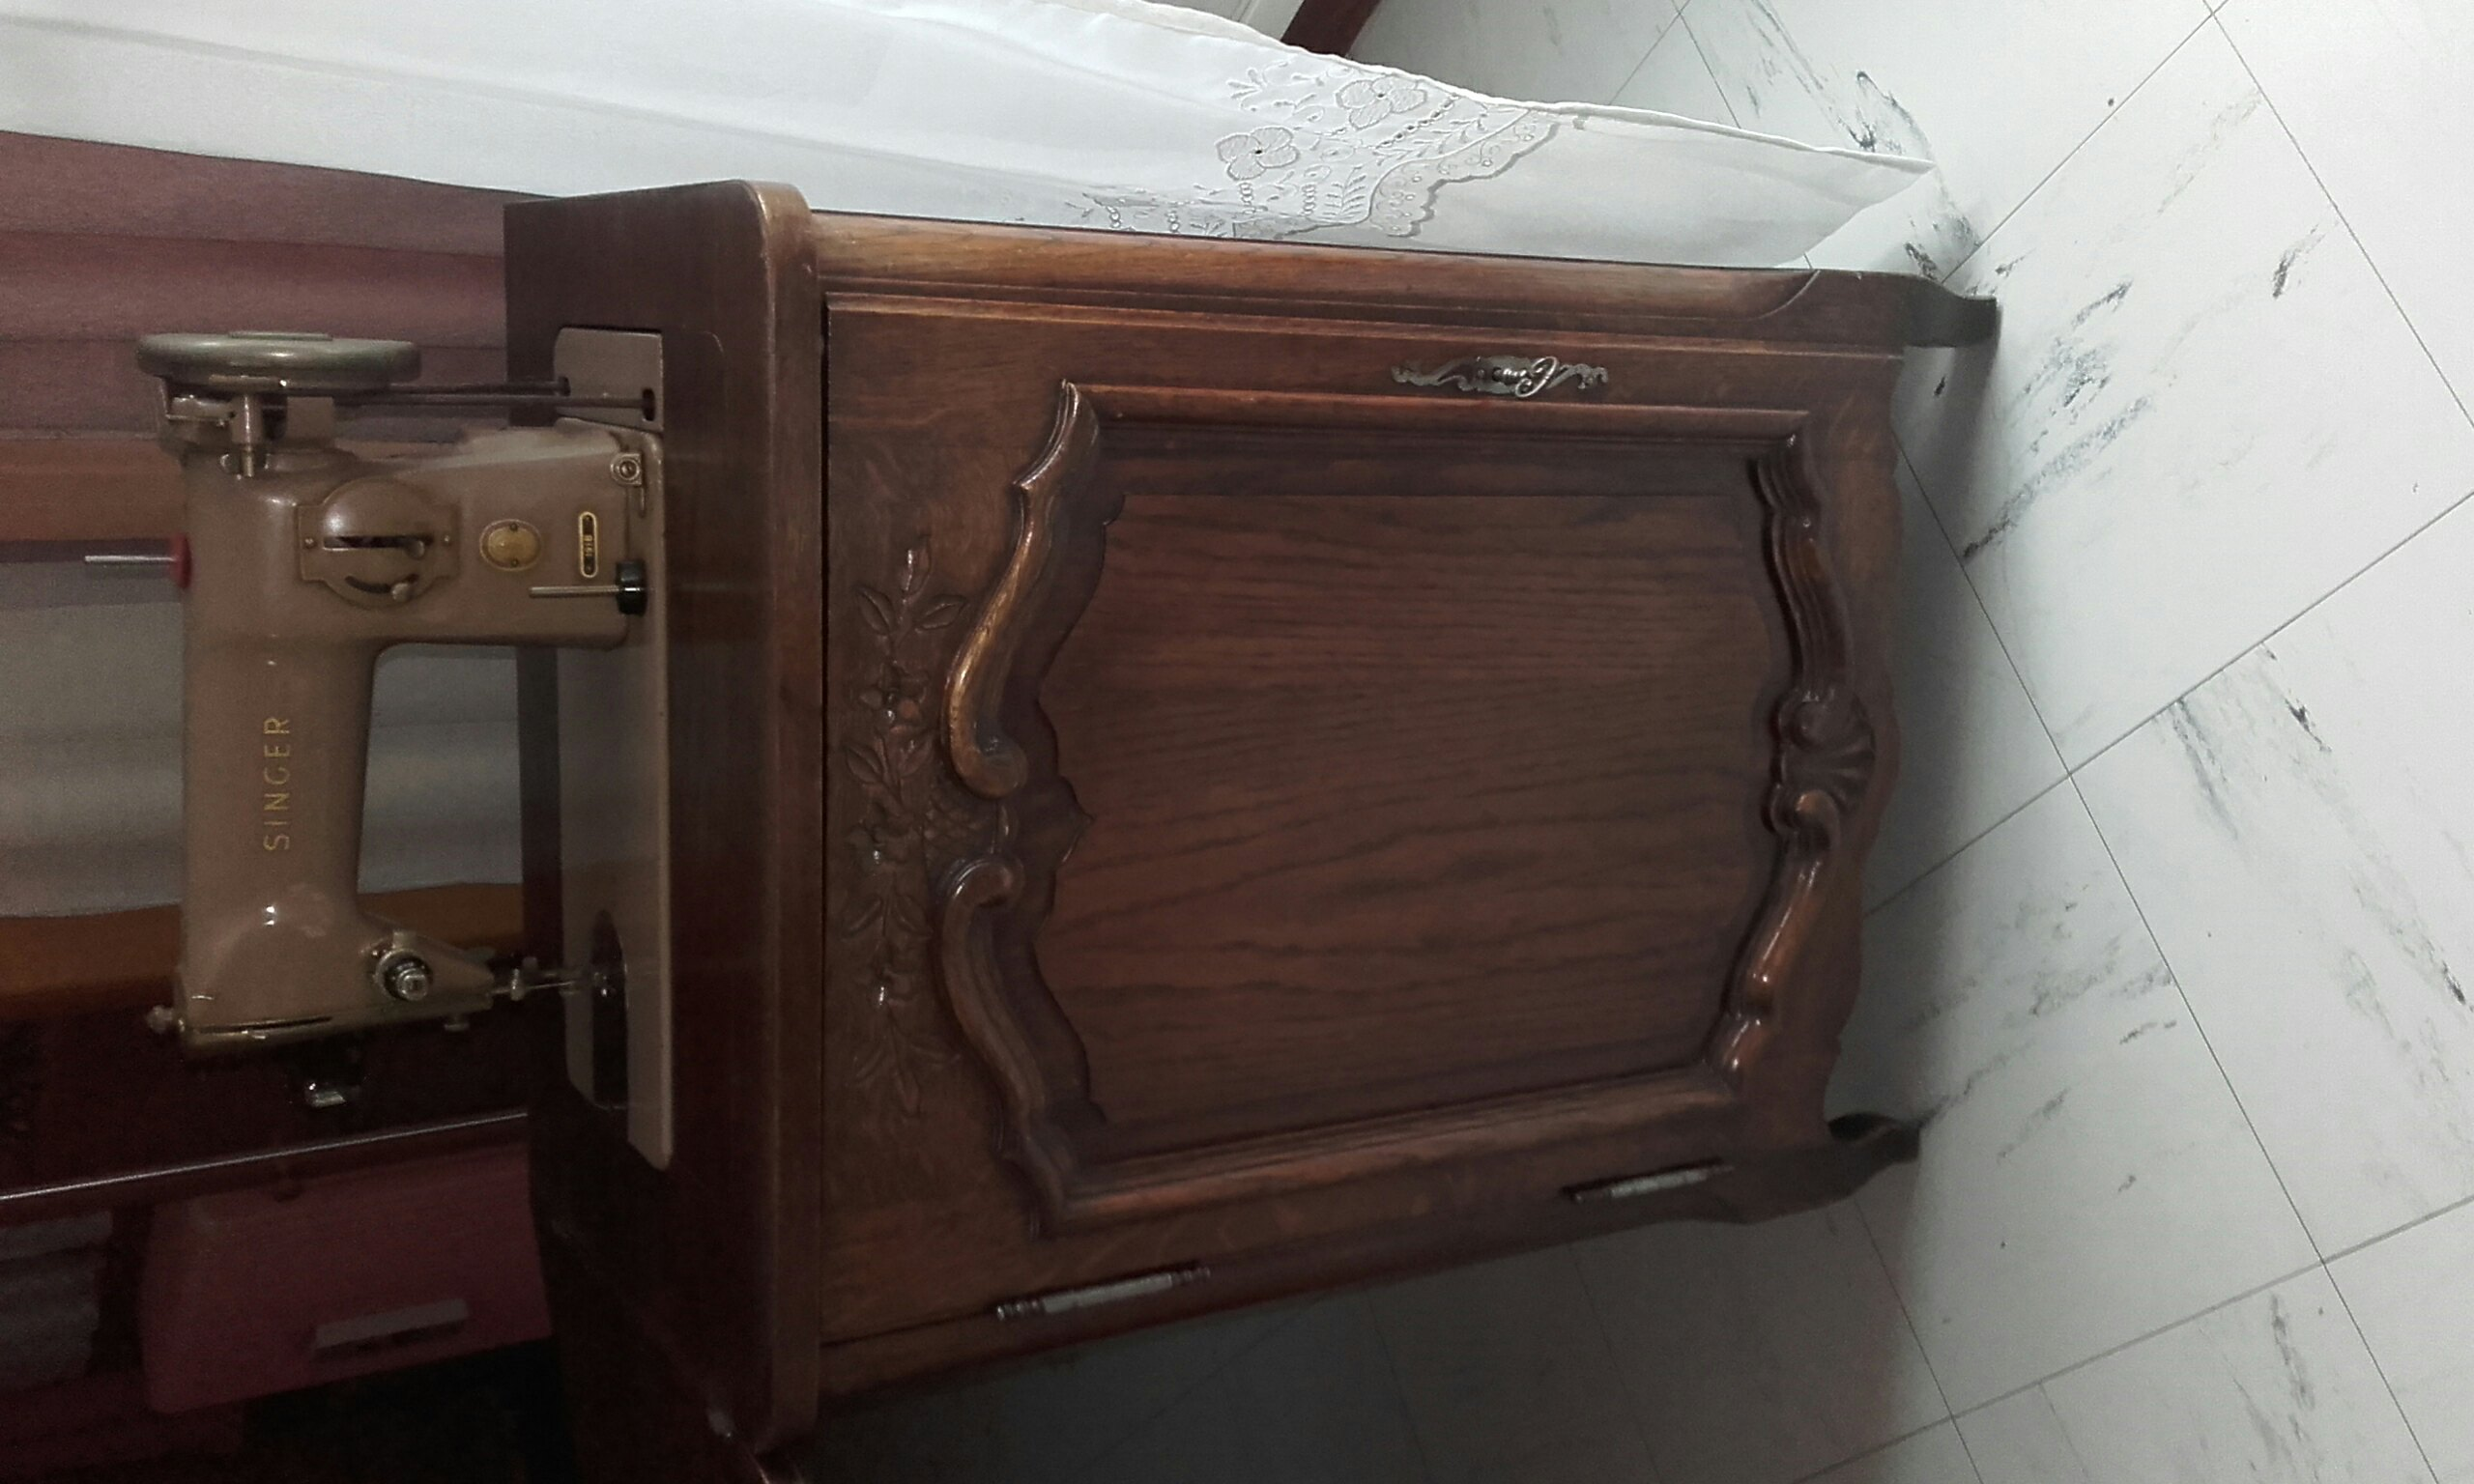 Meubles machine coudre occasion annonces achat et vente de meubles machine coudre - Vente de meuble occasion particulier ...